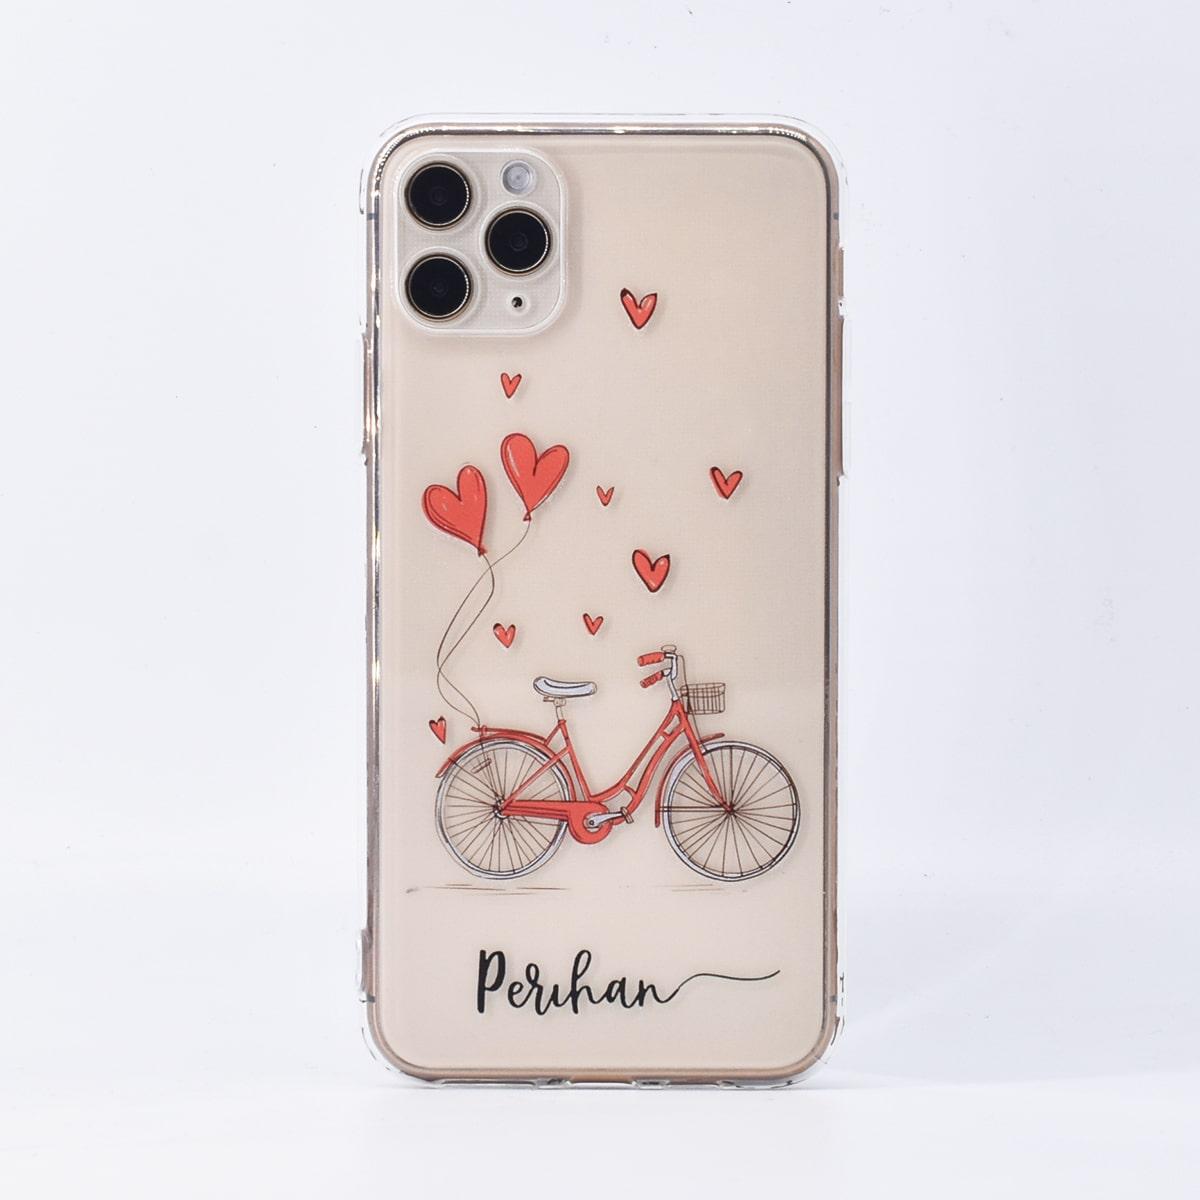 iPhone Etui mit Herzen Ballon & Fahrrad Muster